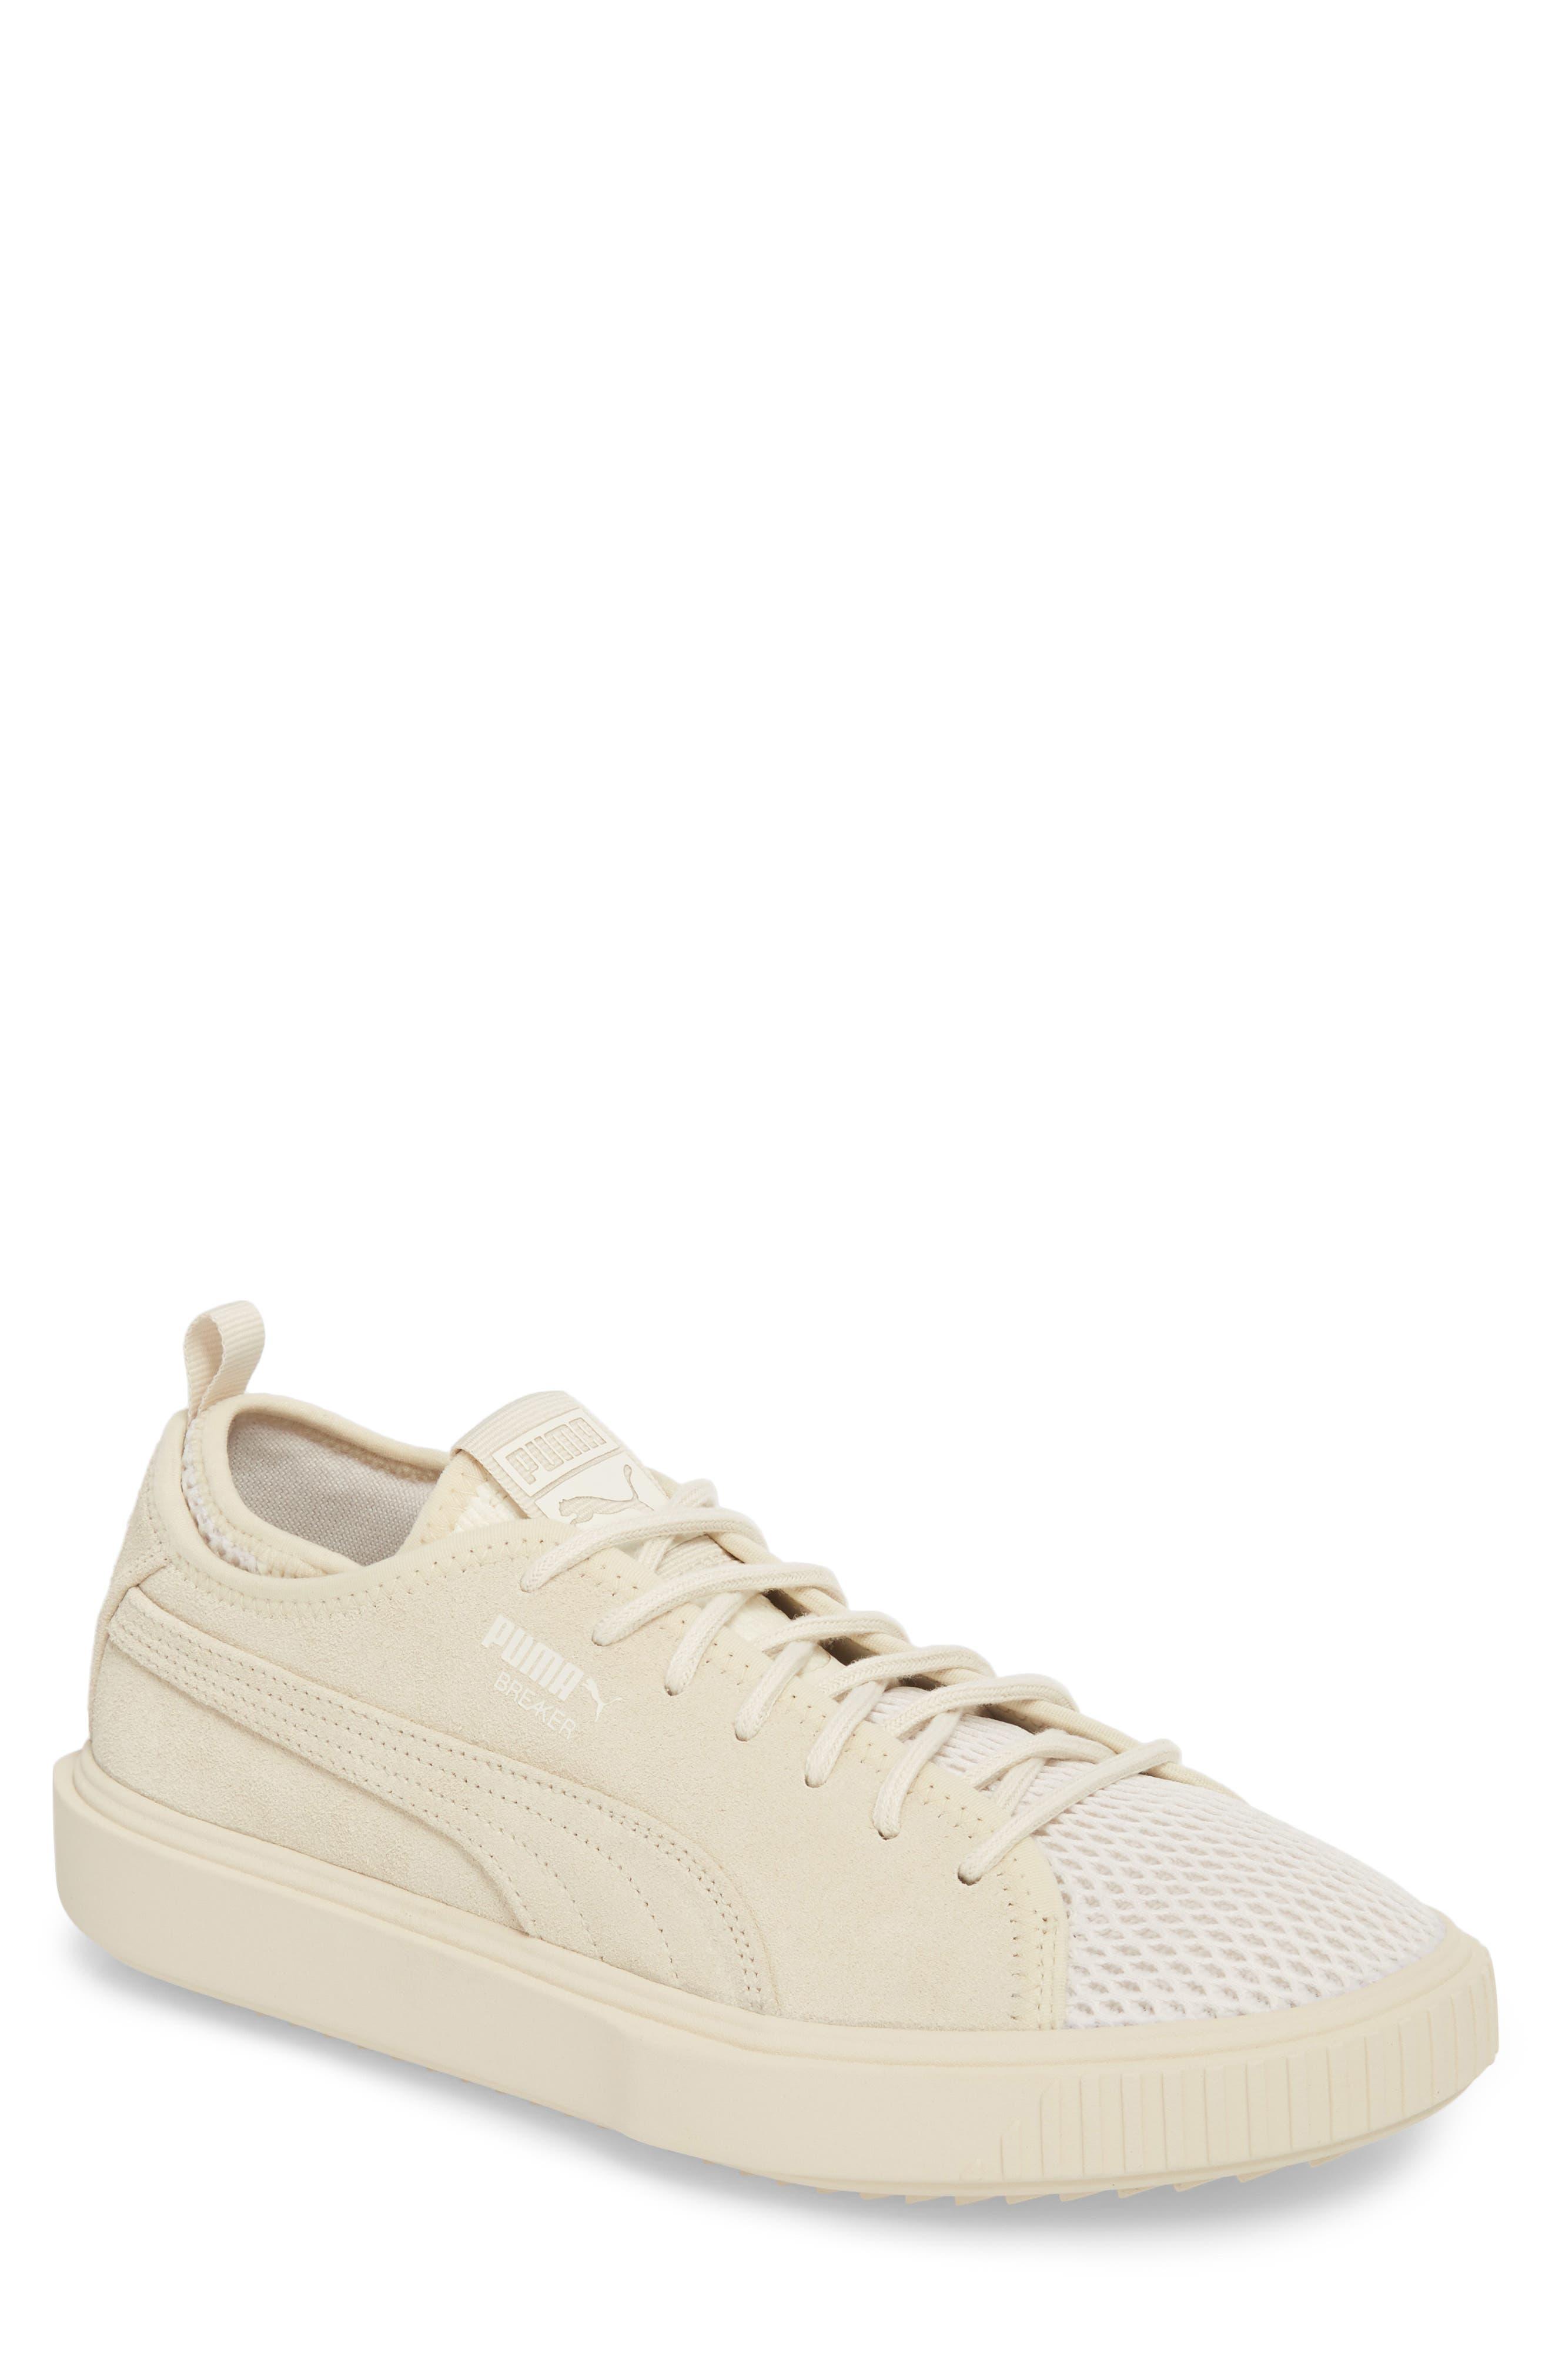 Breaker Mesh Q2 Sneaker,                             Main thumbnail 1, color,                             BIRCH SUEDE